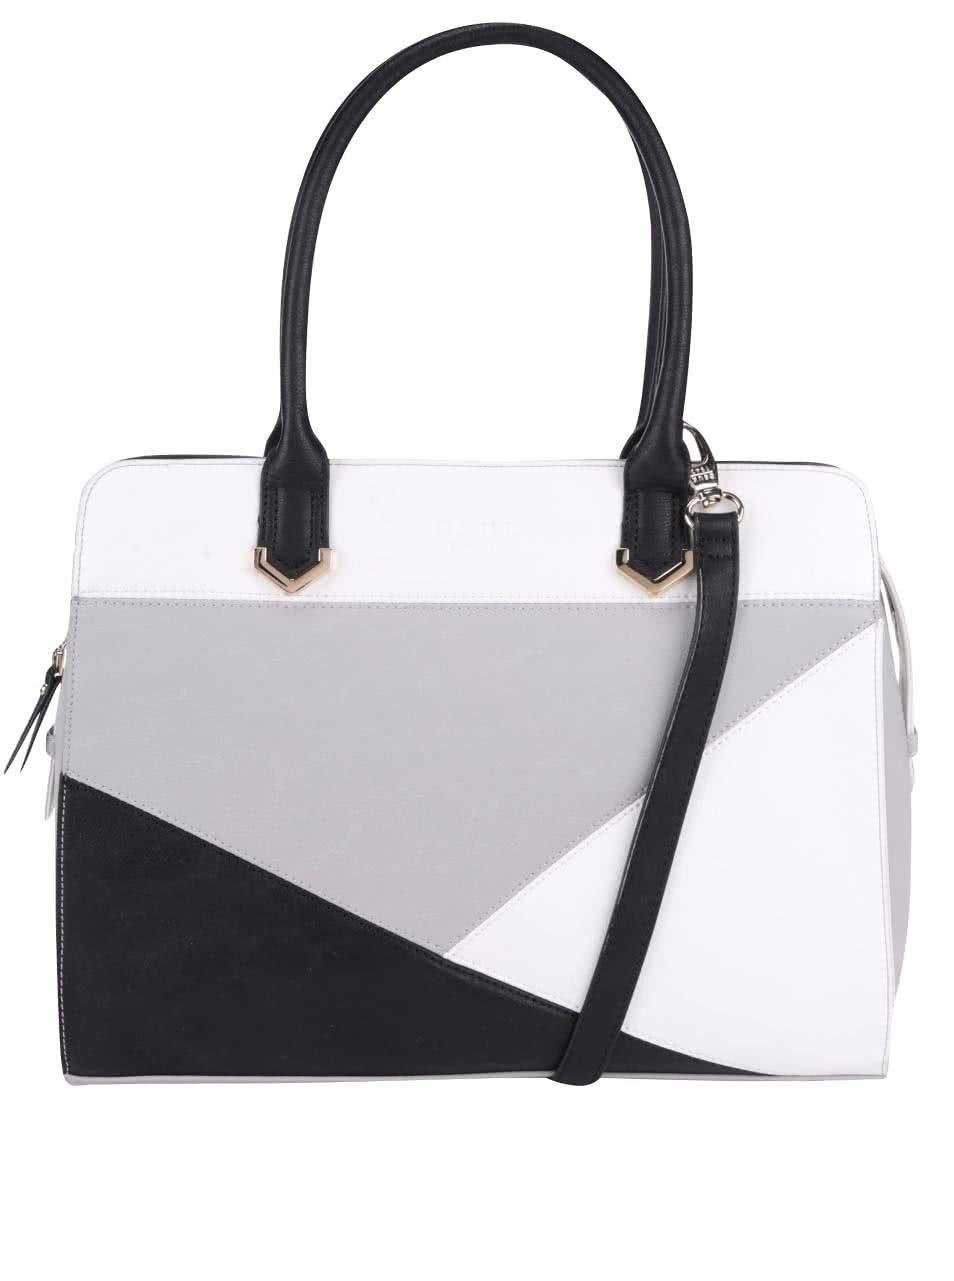 Čierno-bielo-sivá kabelka DSUK ... fcbe0045182